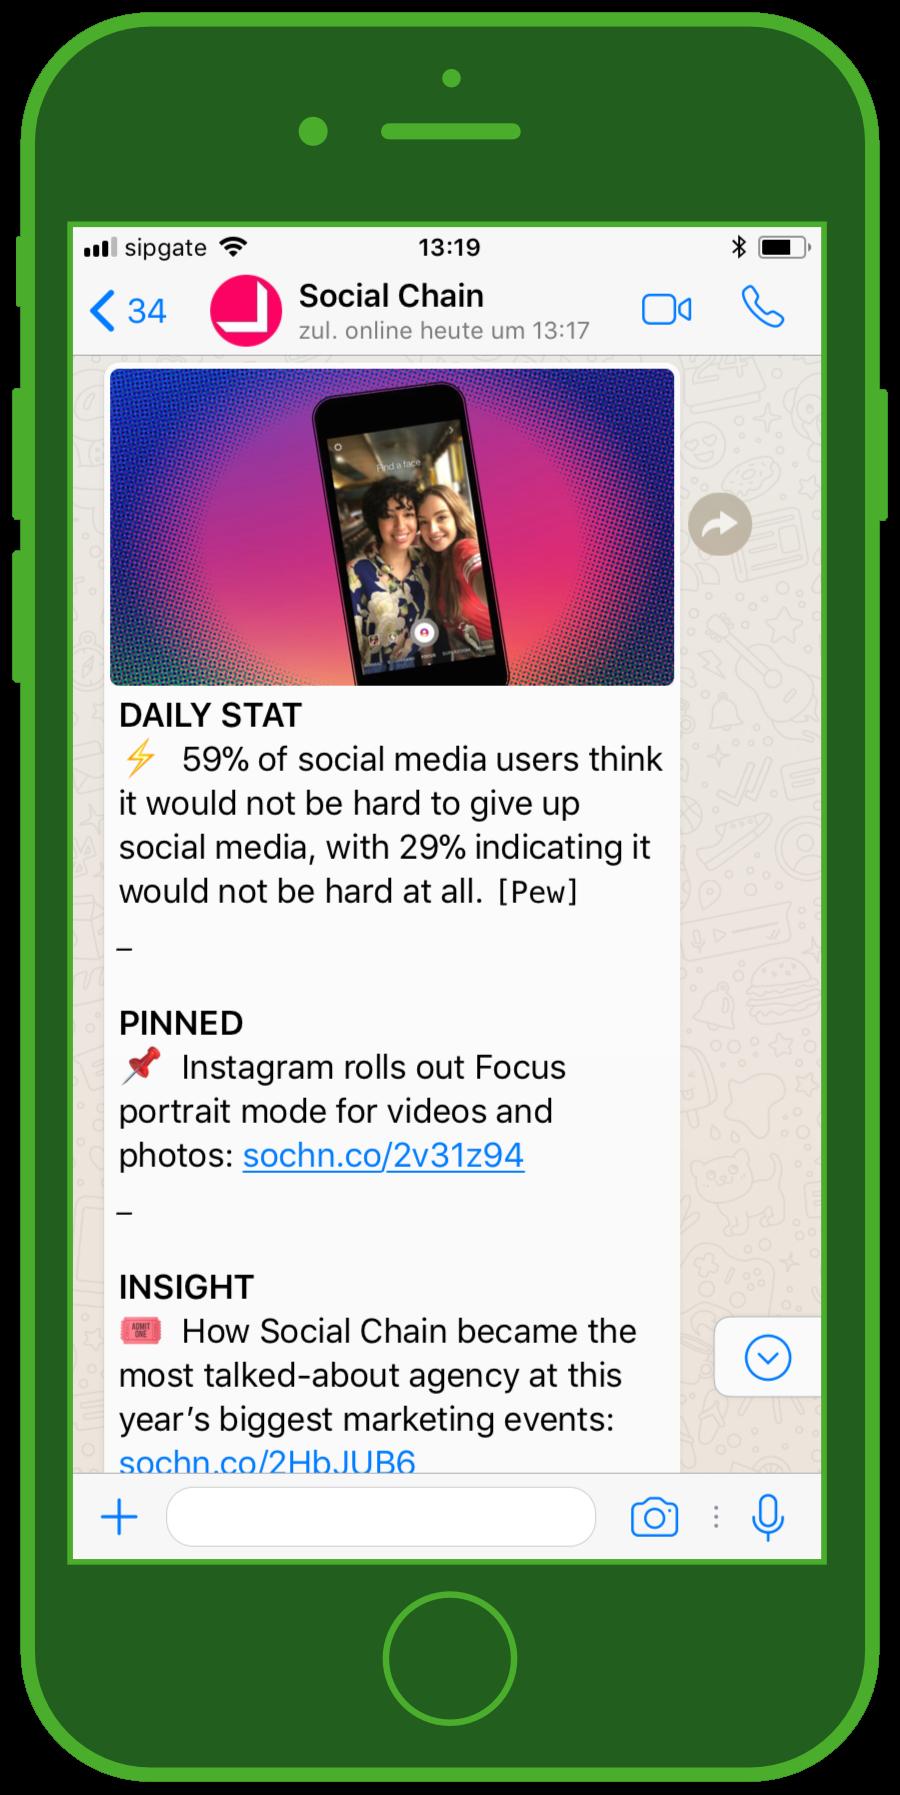 device-social-chain